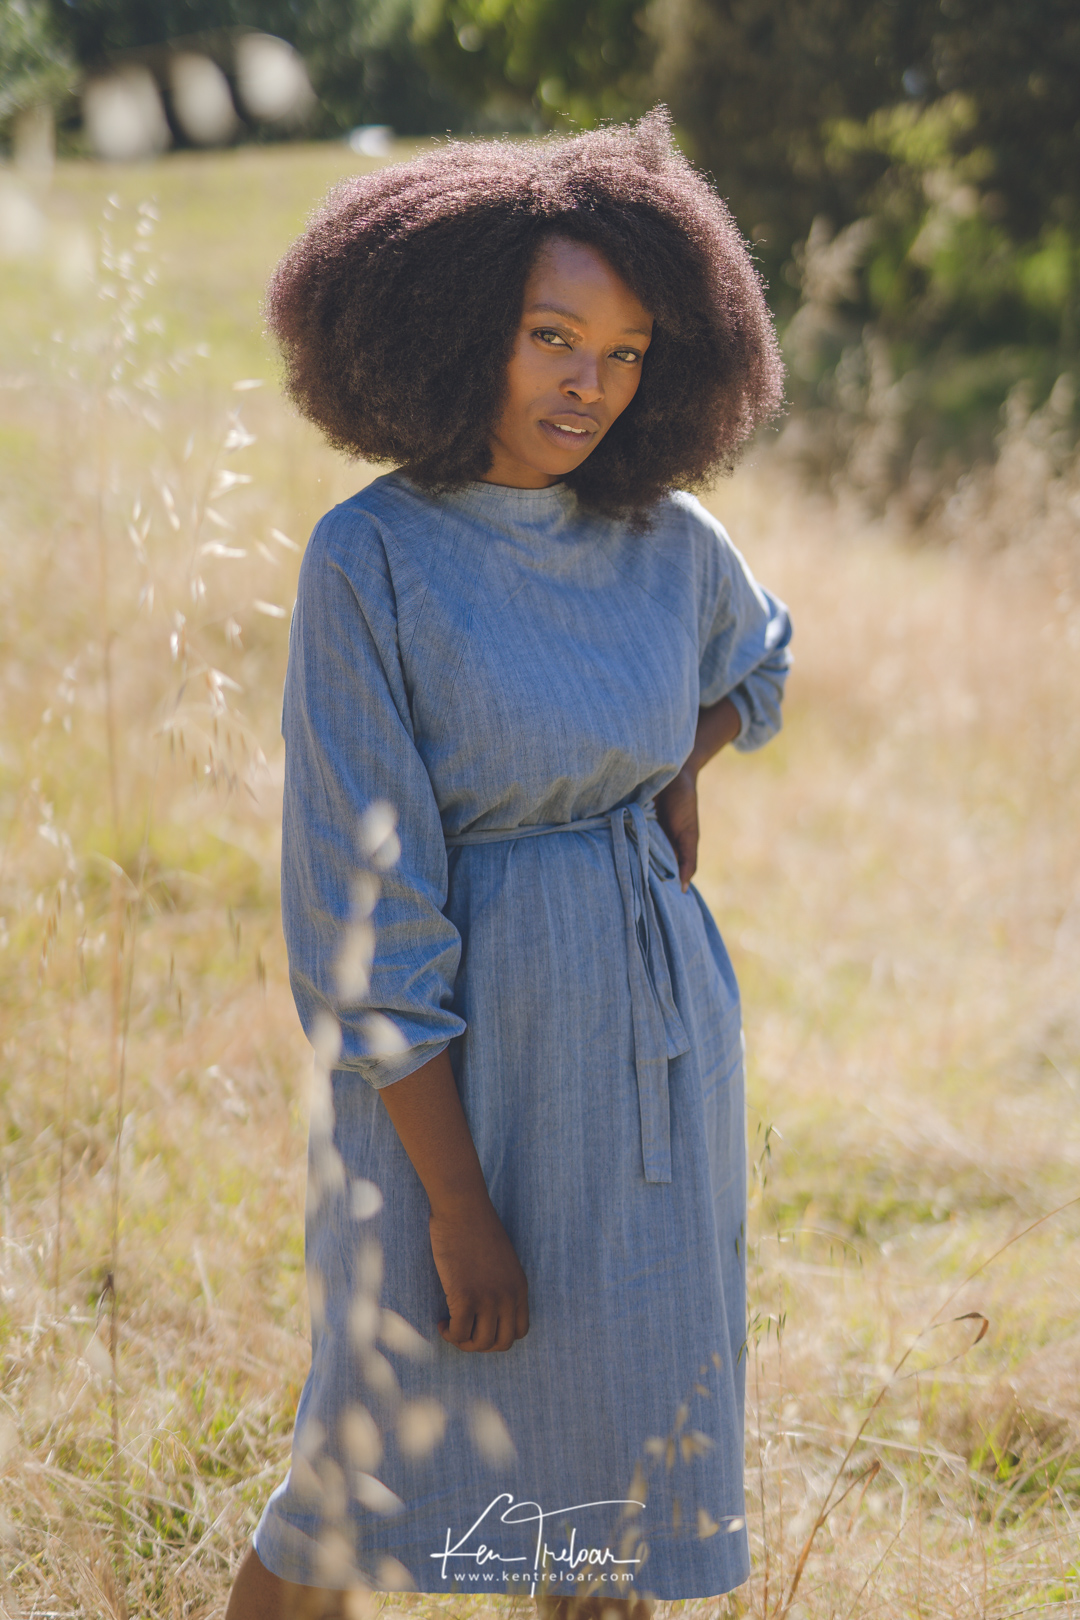 Ken Treloar Photography - Natural L-ight Editorial Portrait Fashion Photo Session - Cape Town Dec 2018-3.jpg